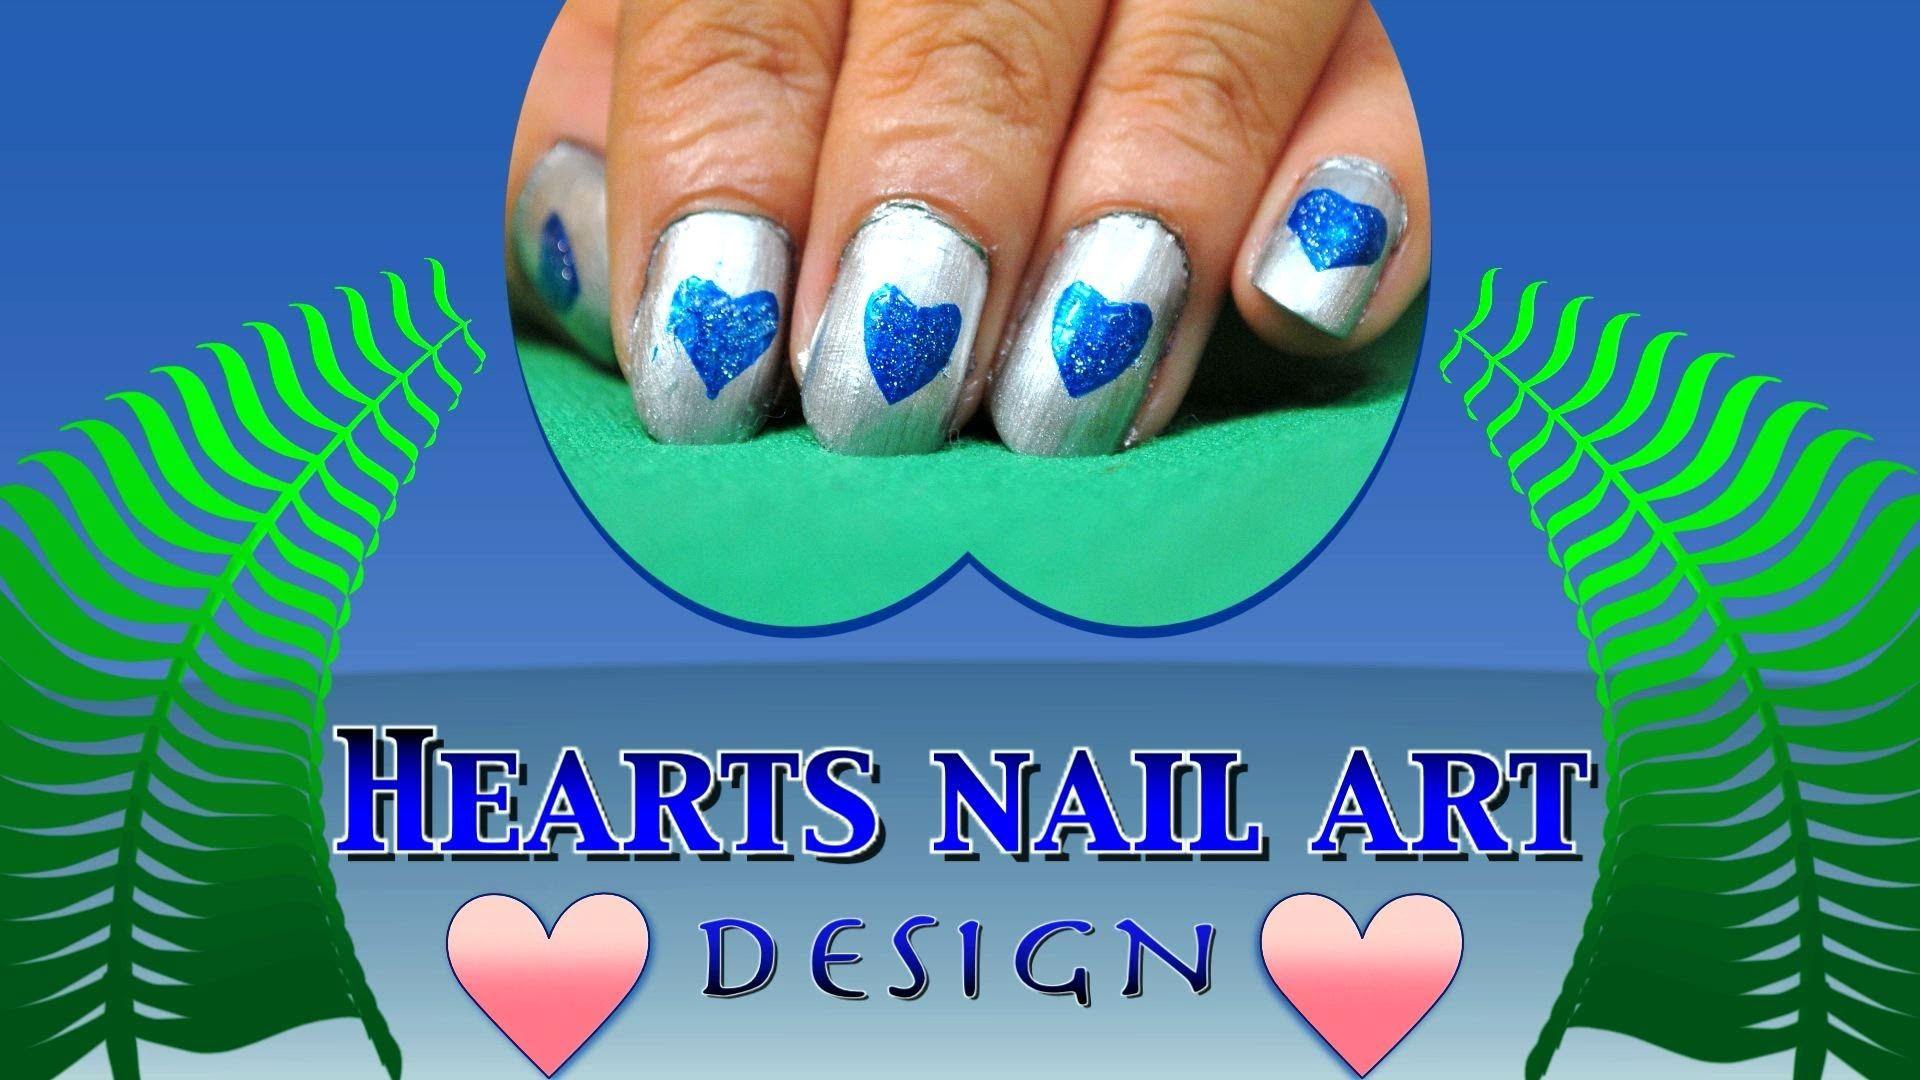 Httpyoutubewatchvpsj6vnat7i nail art designs httpyoutubewatchvpsj6vnat7i solutioingenieria Choice Image